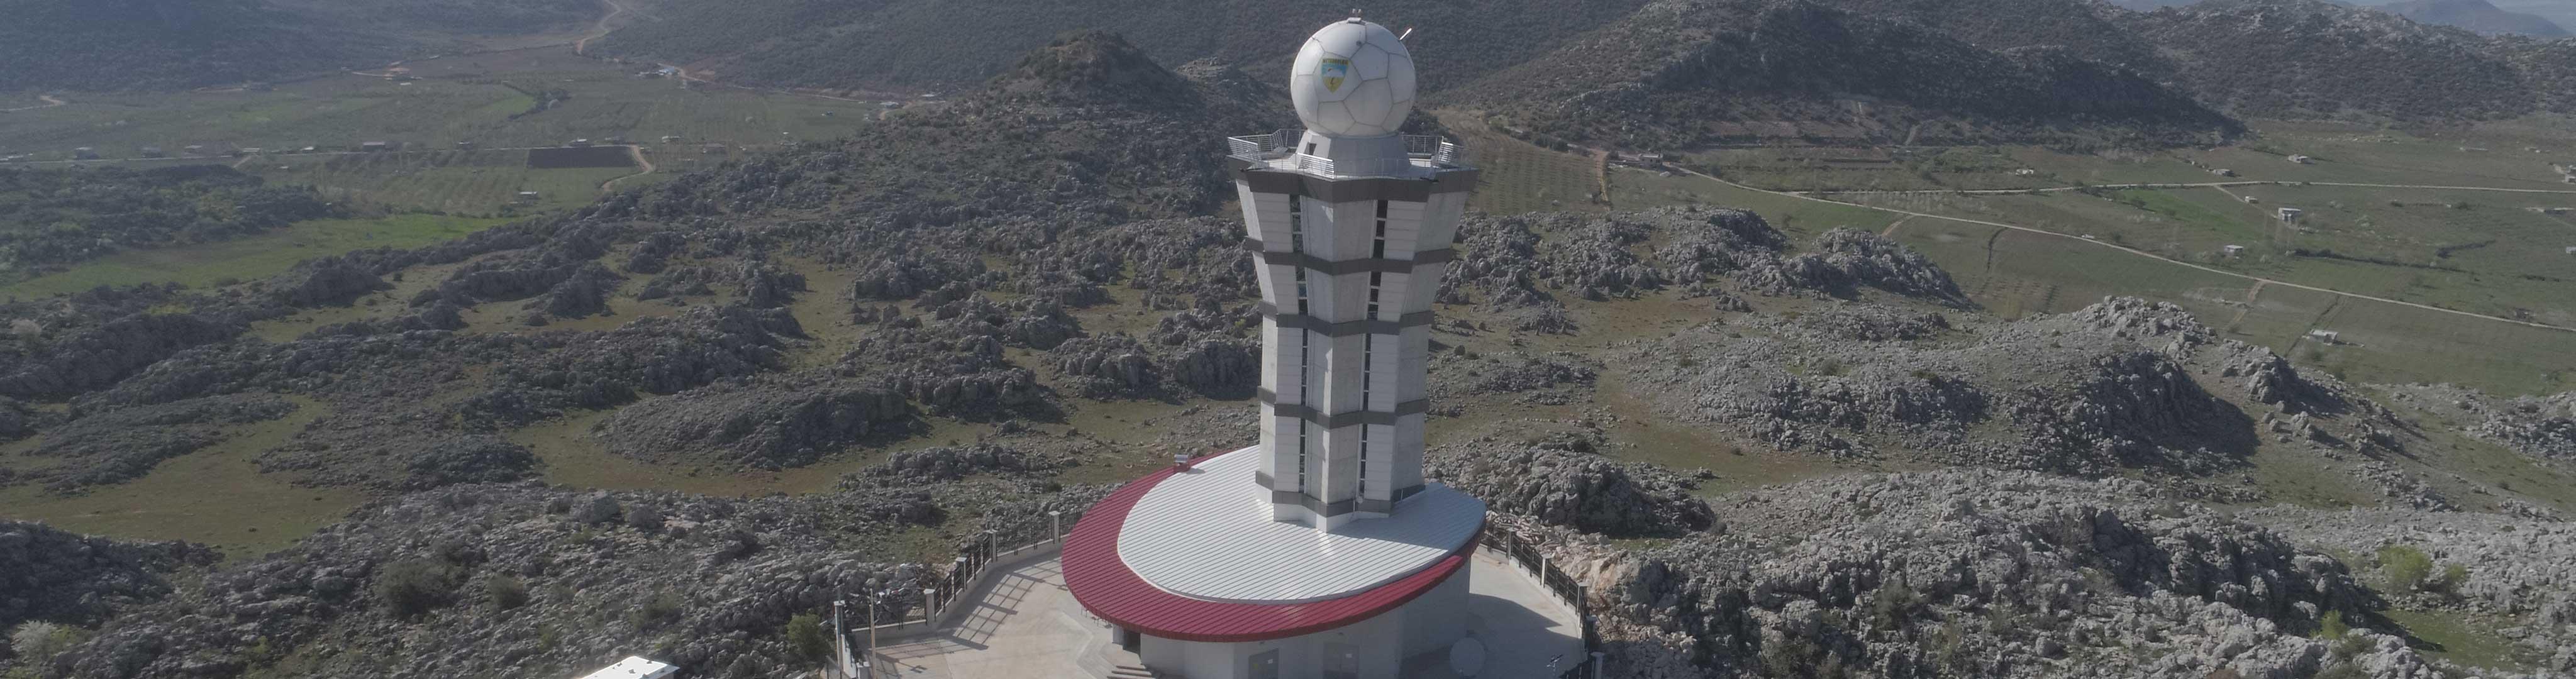 <h3>C-BAND METEOROLOGICAL RADAR</h3>  <p>For Turkish State Meteorological Service</p>